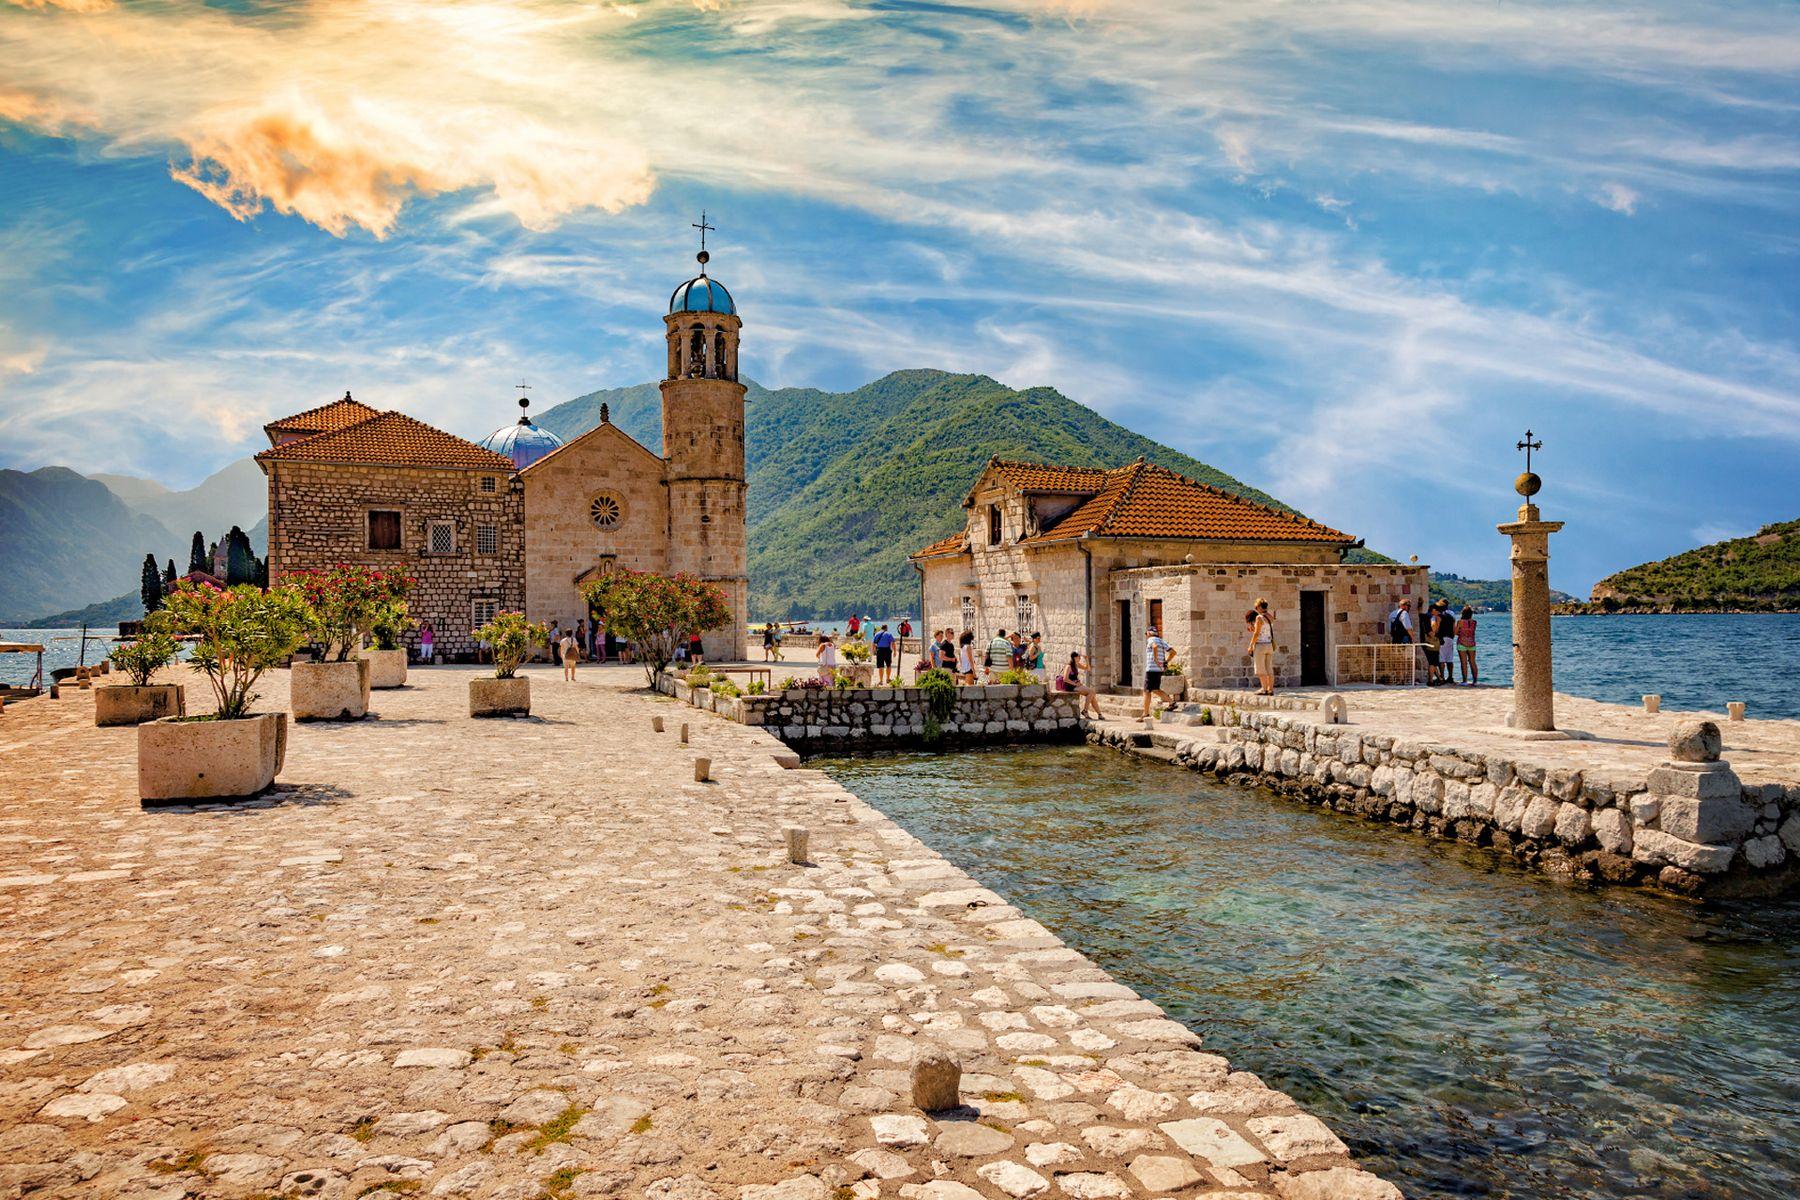 gehört albanien zum balkan